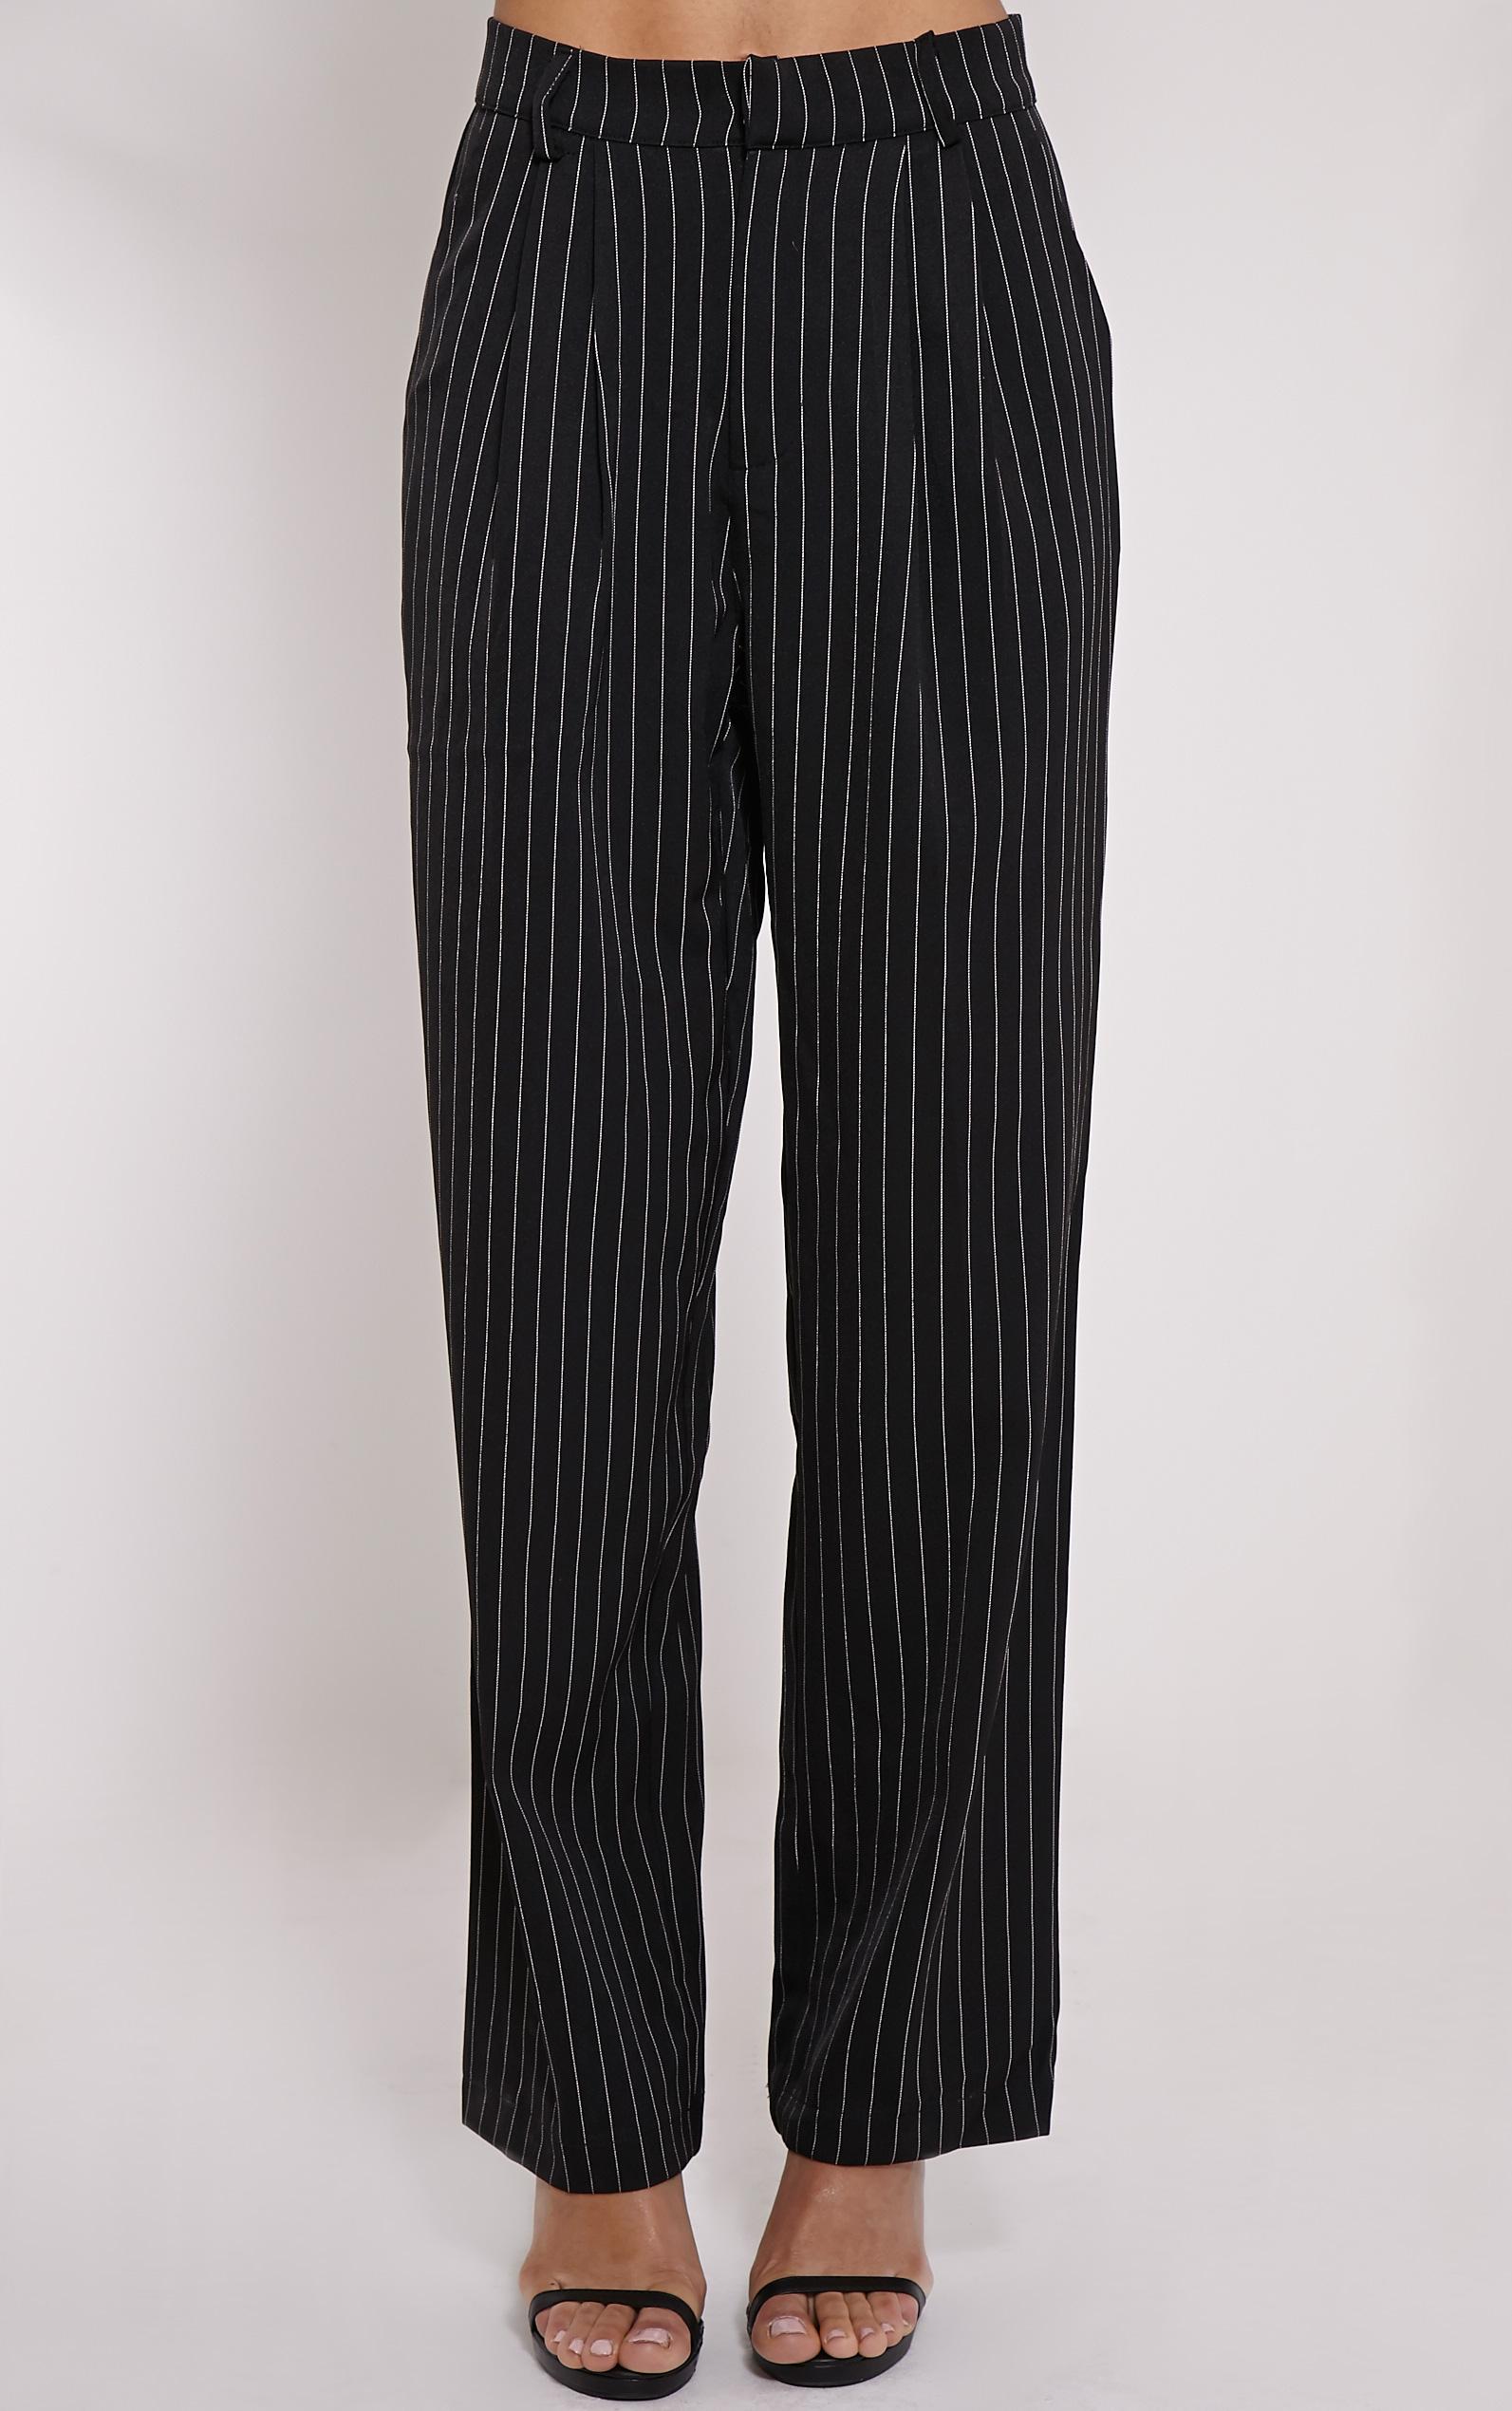 Adalyn Black Pinstripe Wide Leg Trousers 2